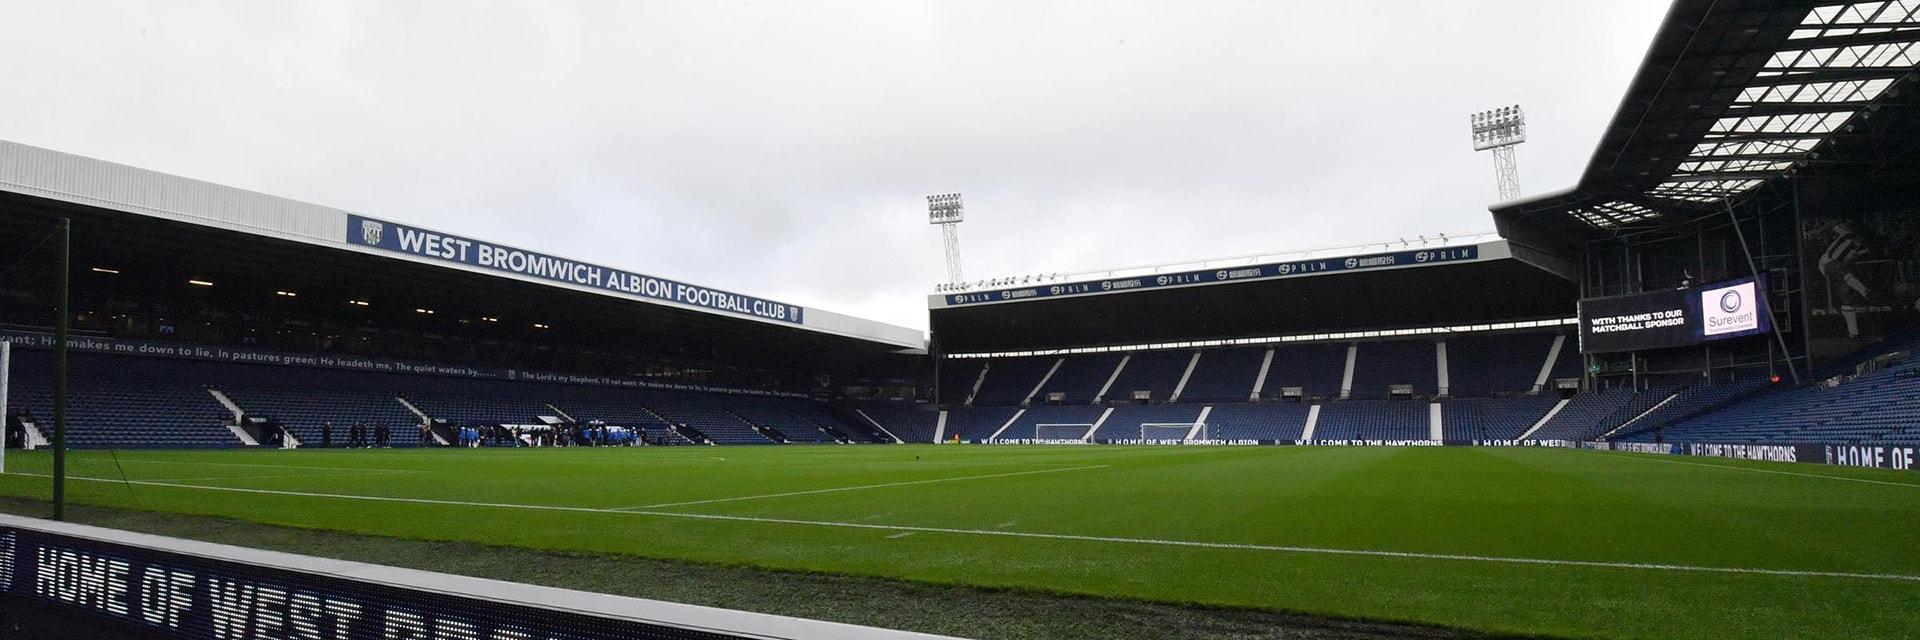 West Bromwich Albion - Hull City, 5 aprilom 15:00